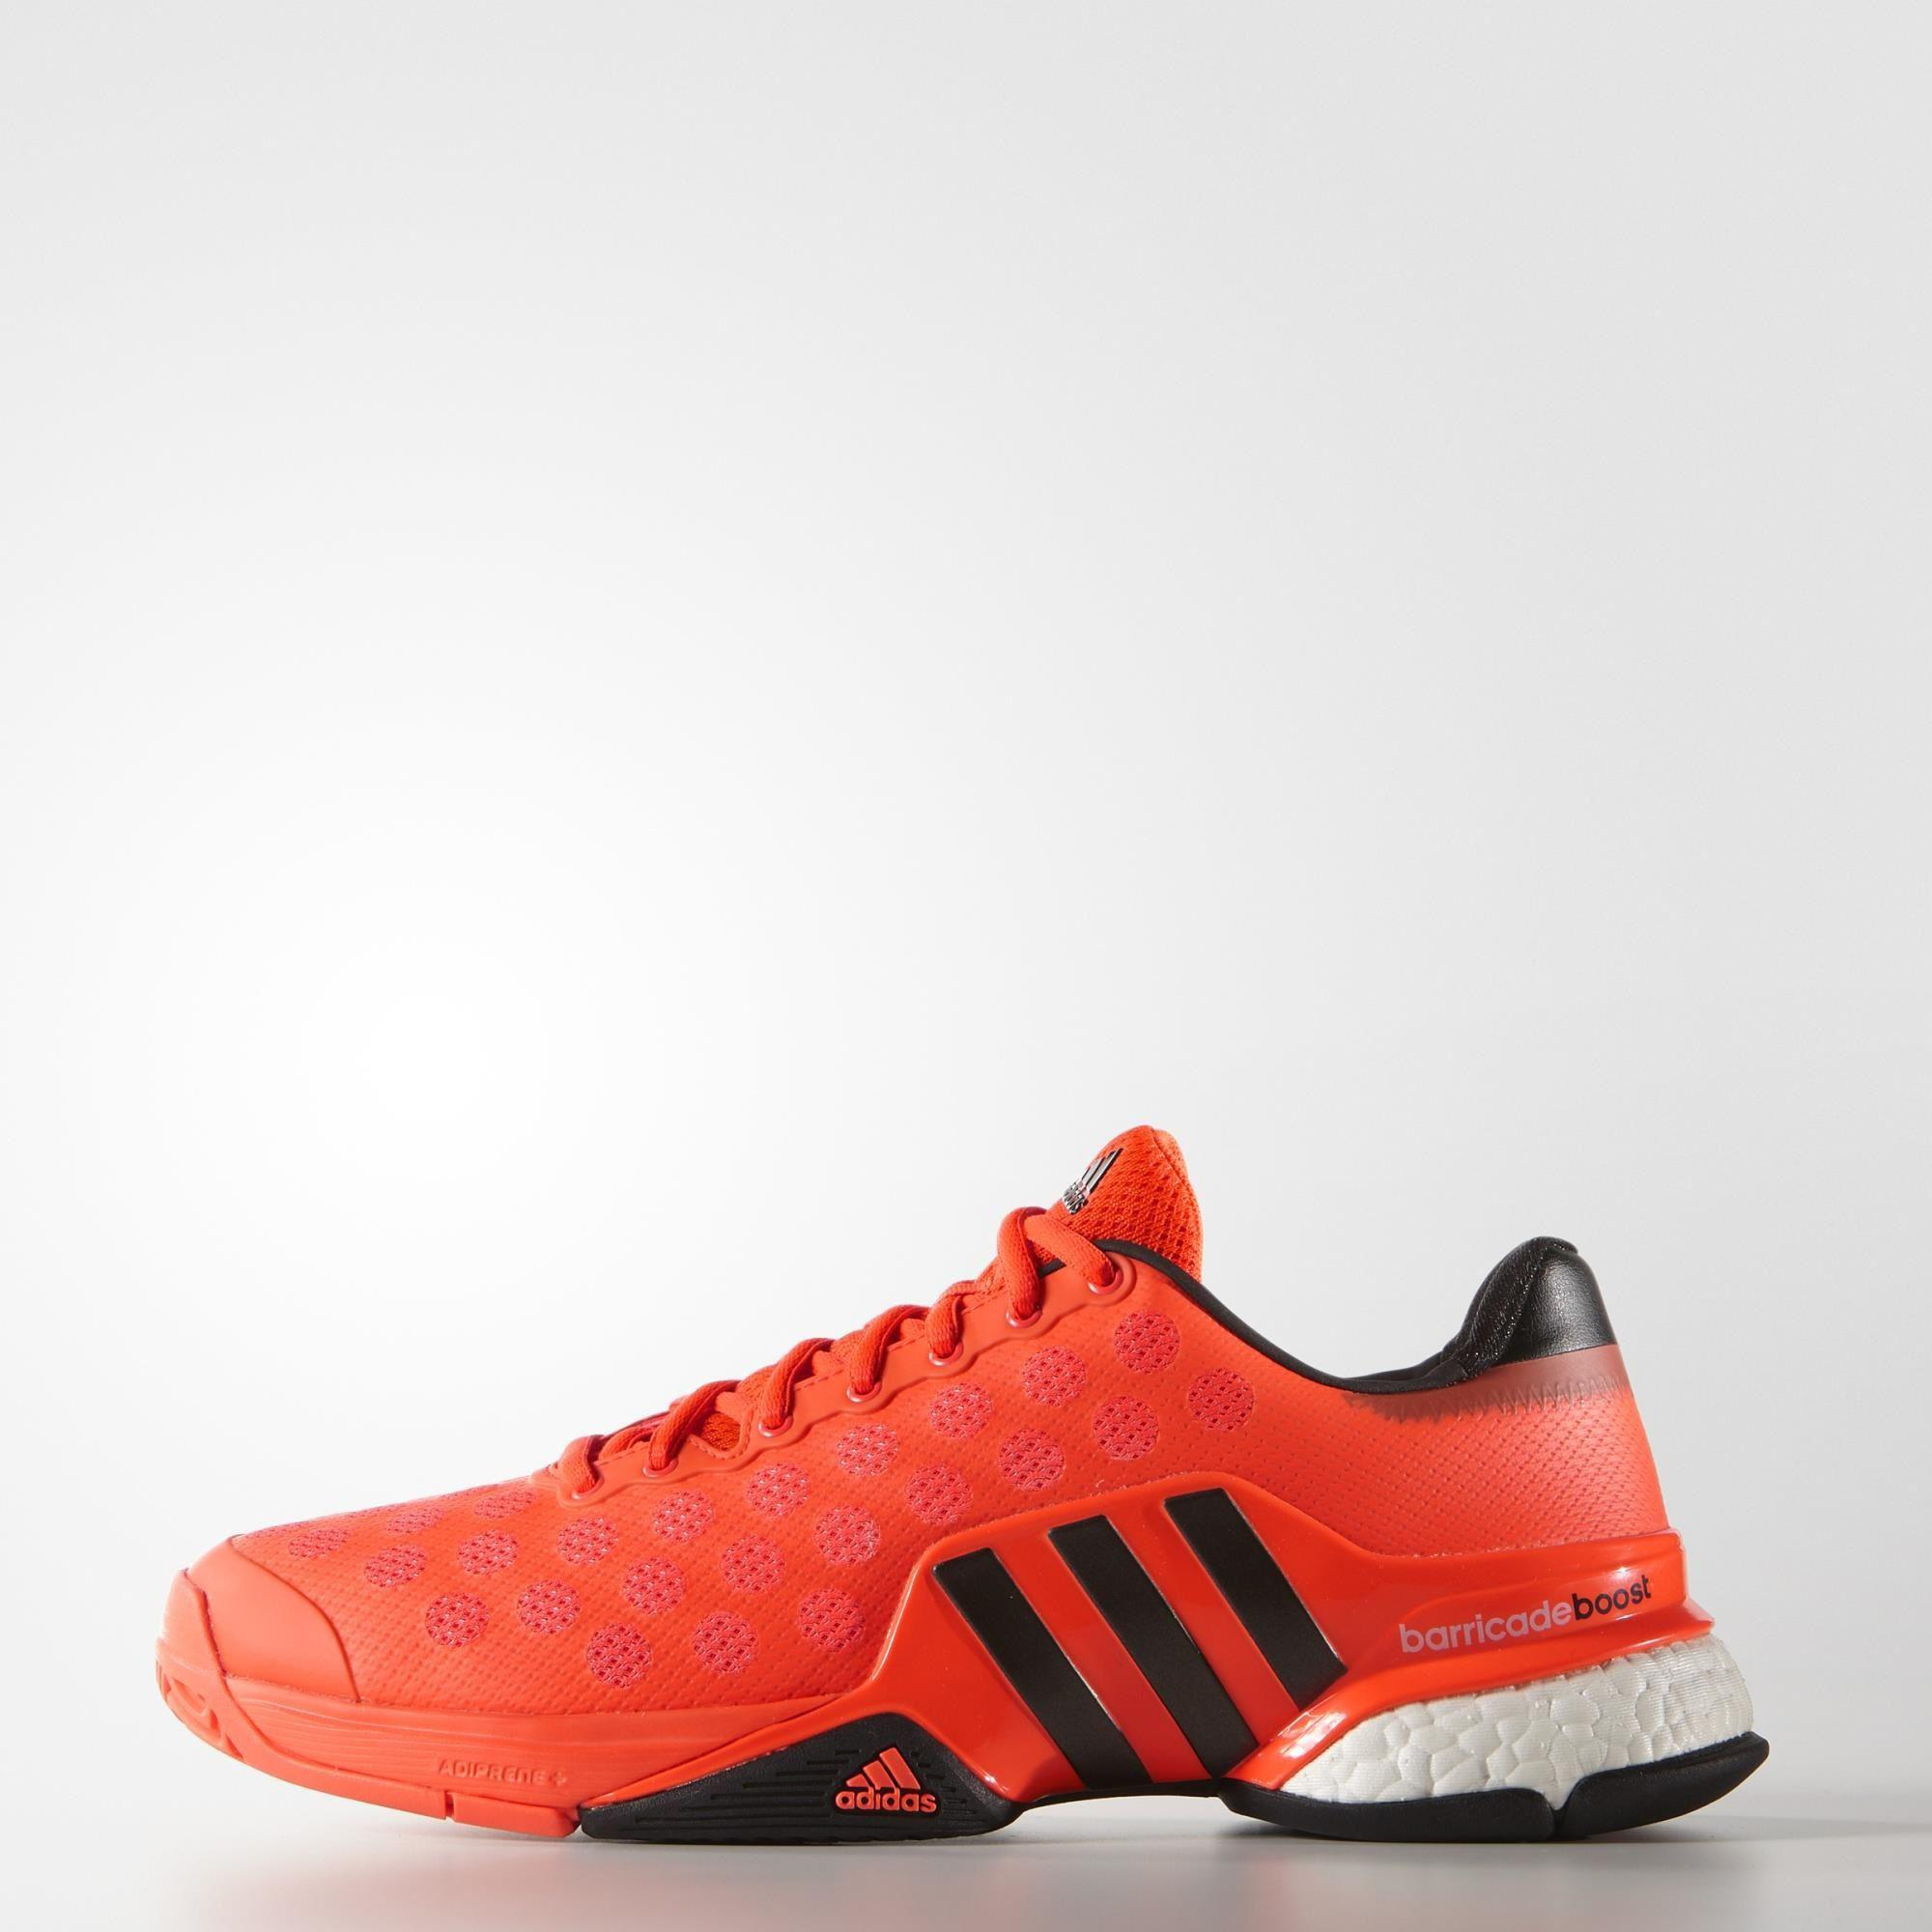 Boost Tennis Barricade Mens Edition Adidas Limited 2015 Shoes wOiuPTkXZ